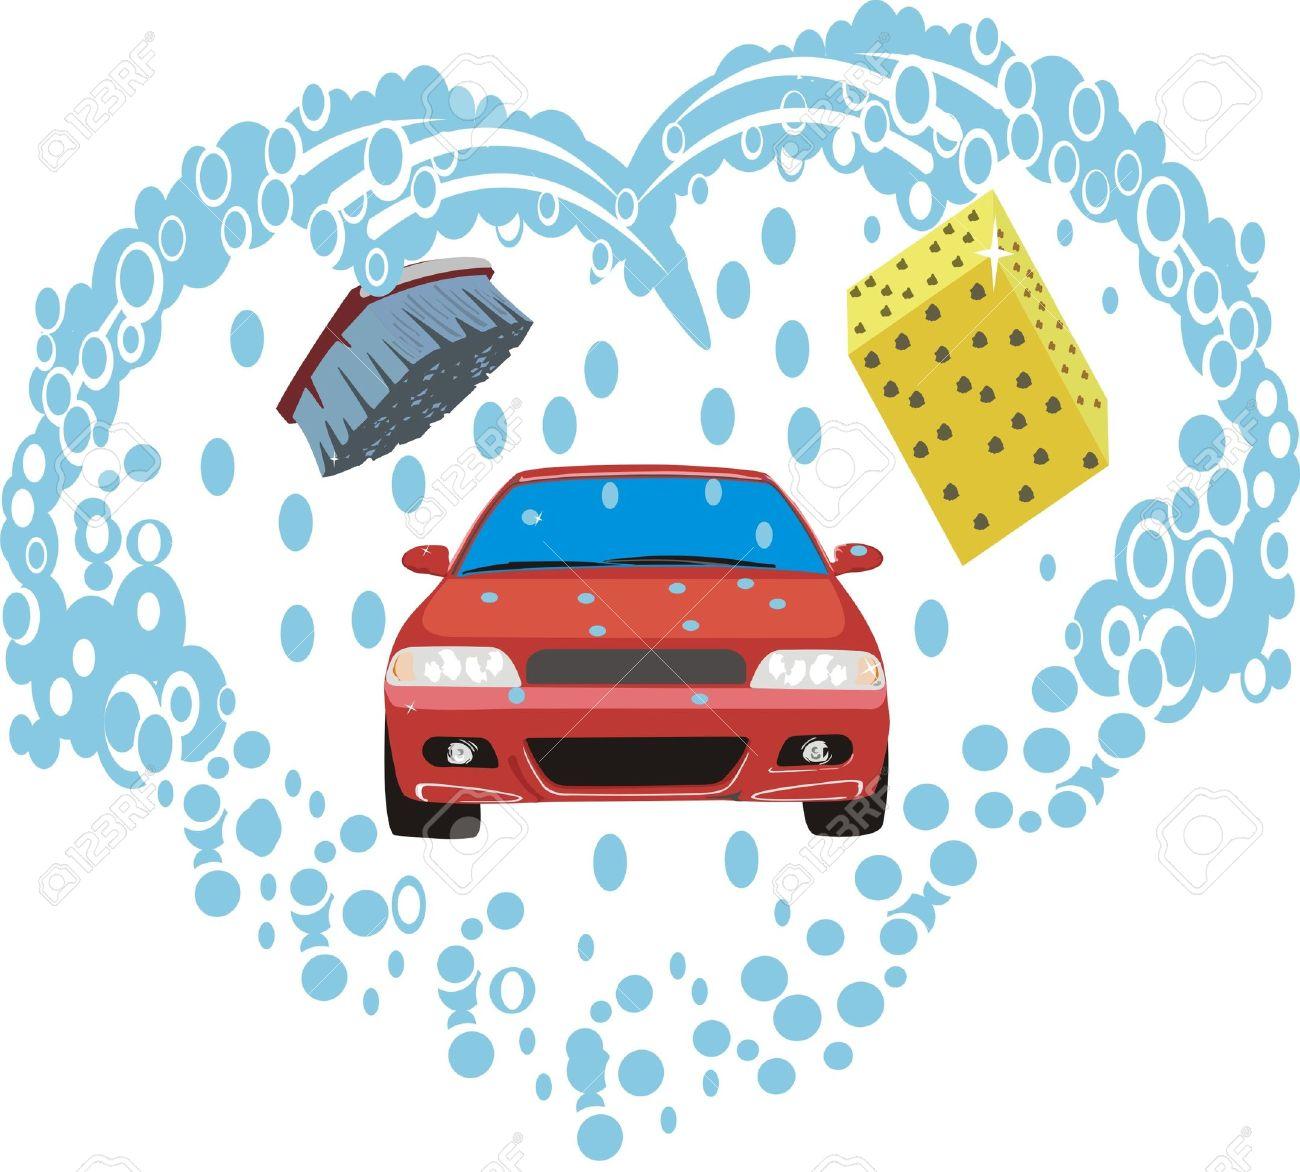 Car washing clipart image free download Water car wash clipart - ClipartFest image free download